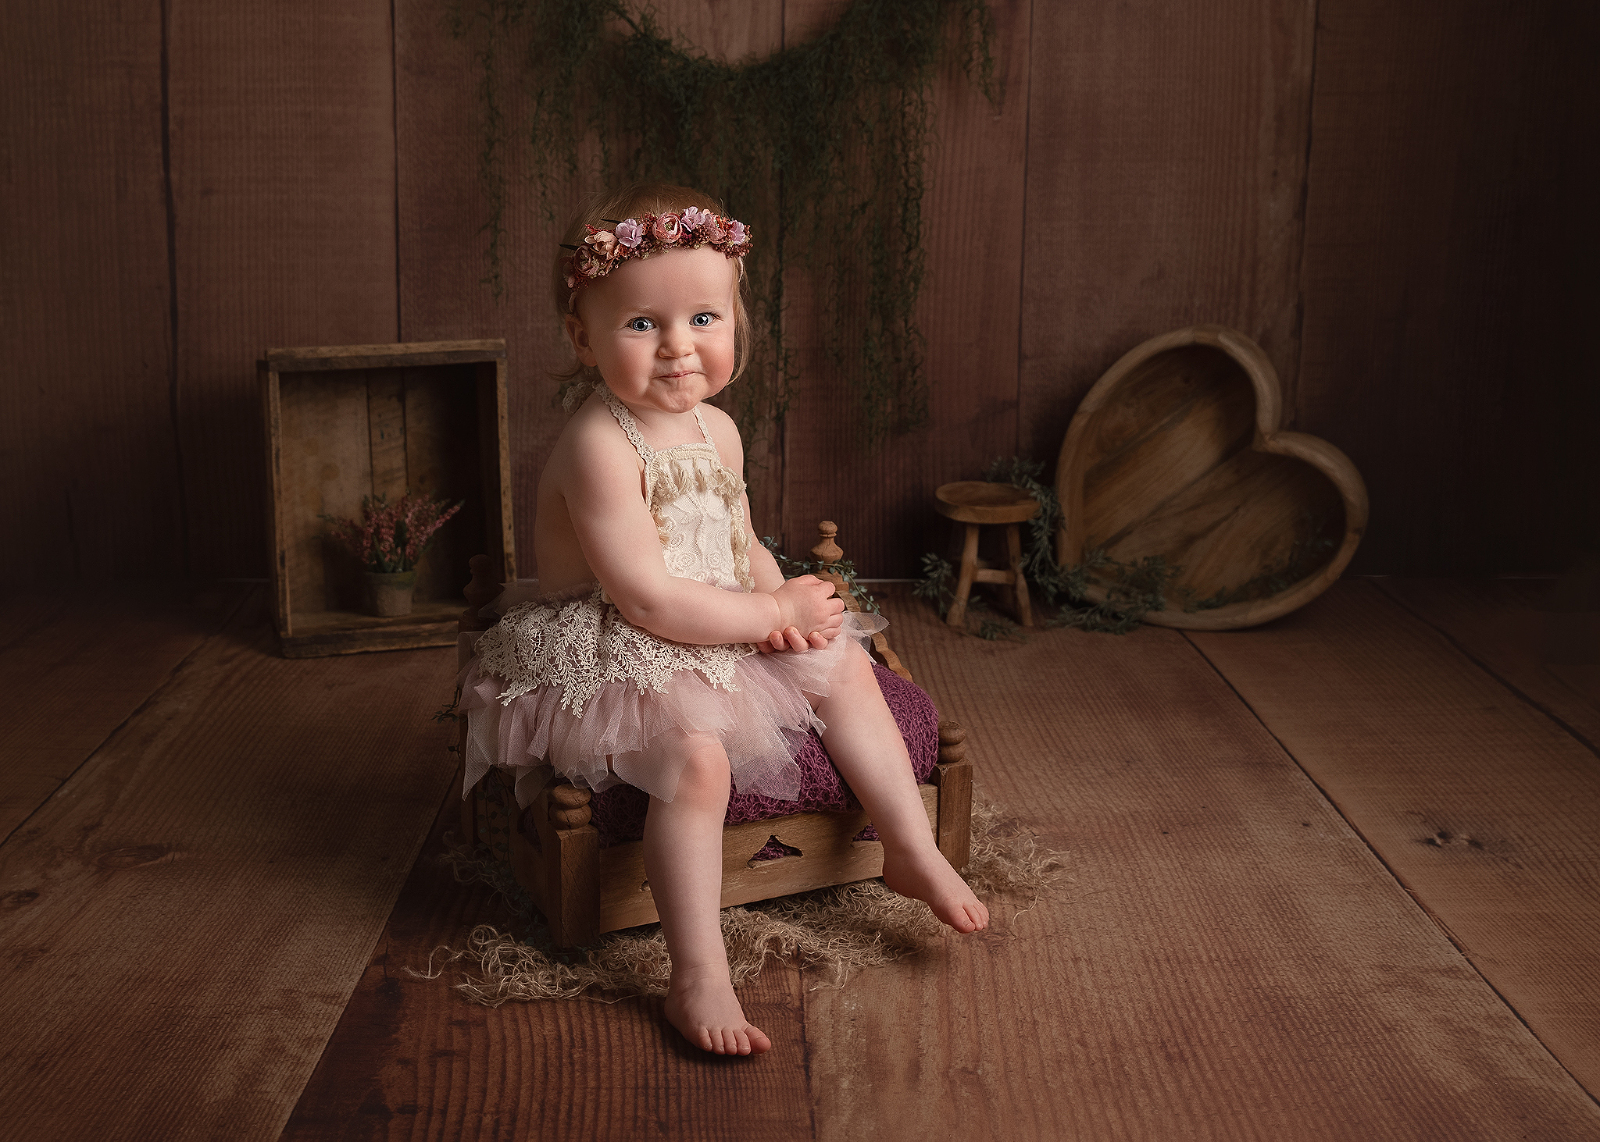 Baby girl sitter photo shoot in studio Hereford, Herefordshire